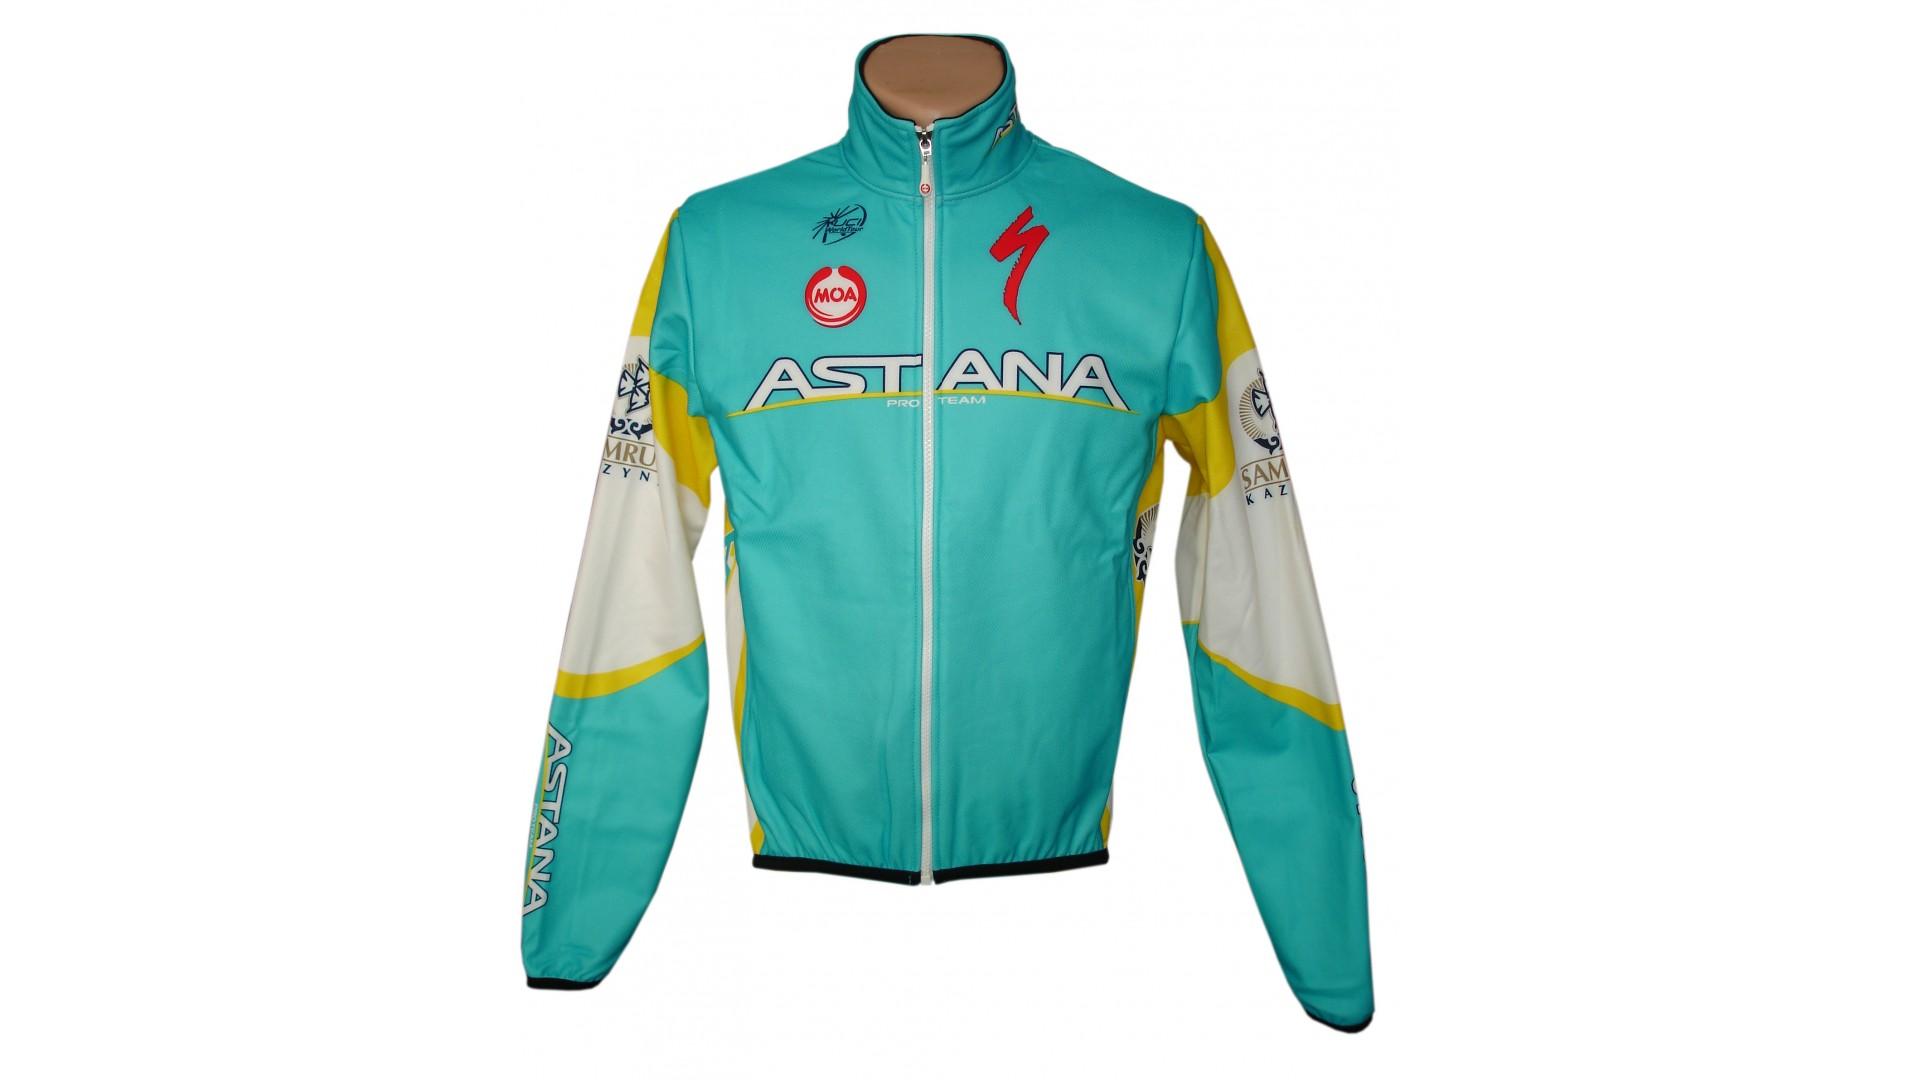 Велокуртка Nalini Astana зимняя вид спереди